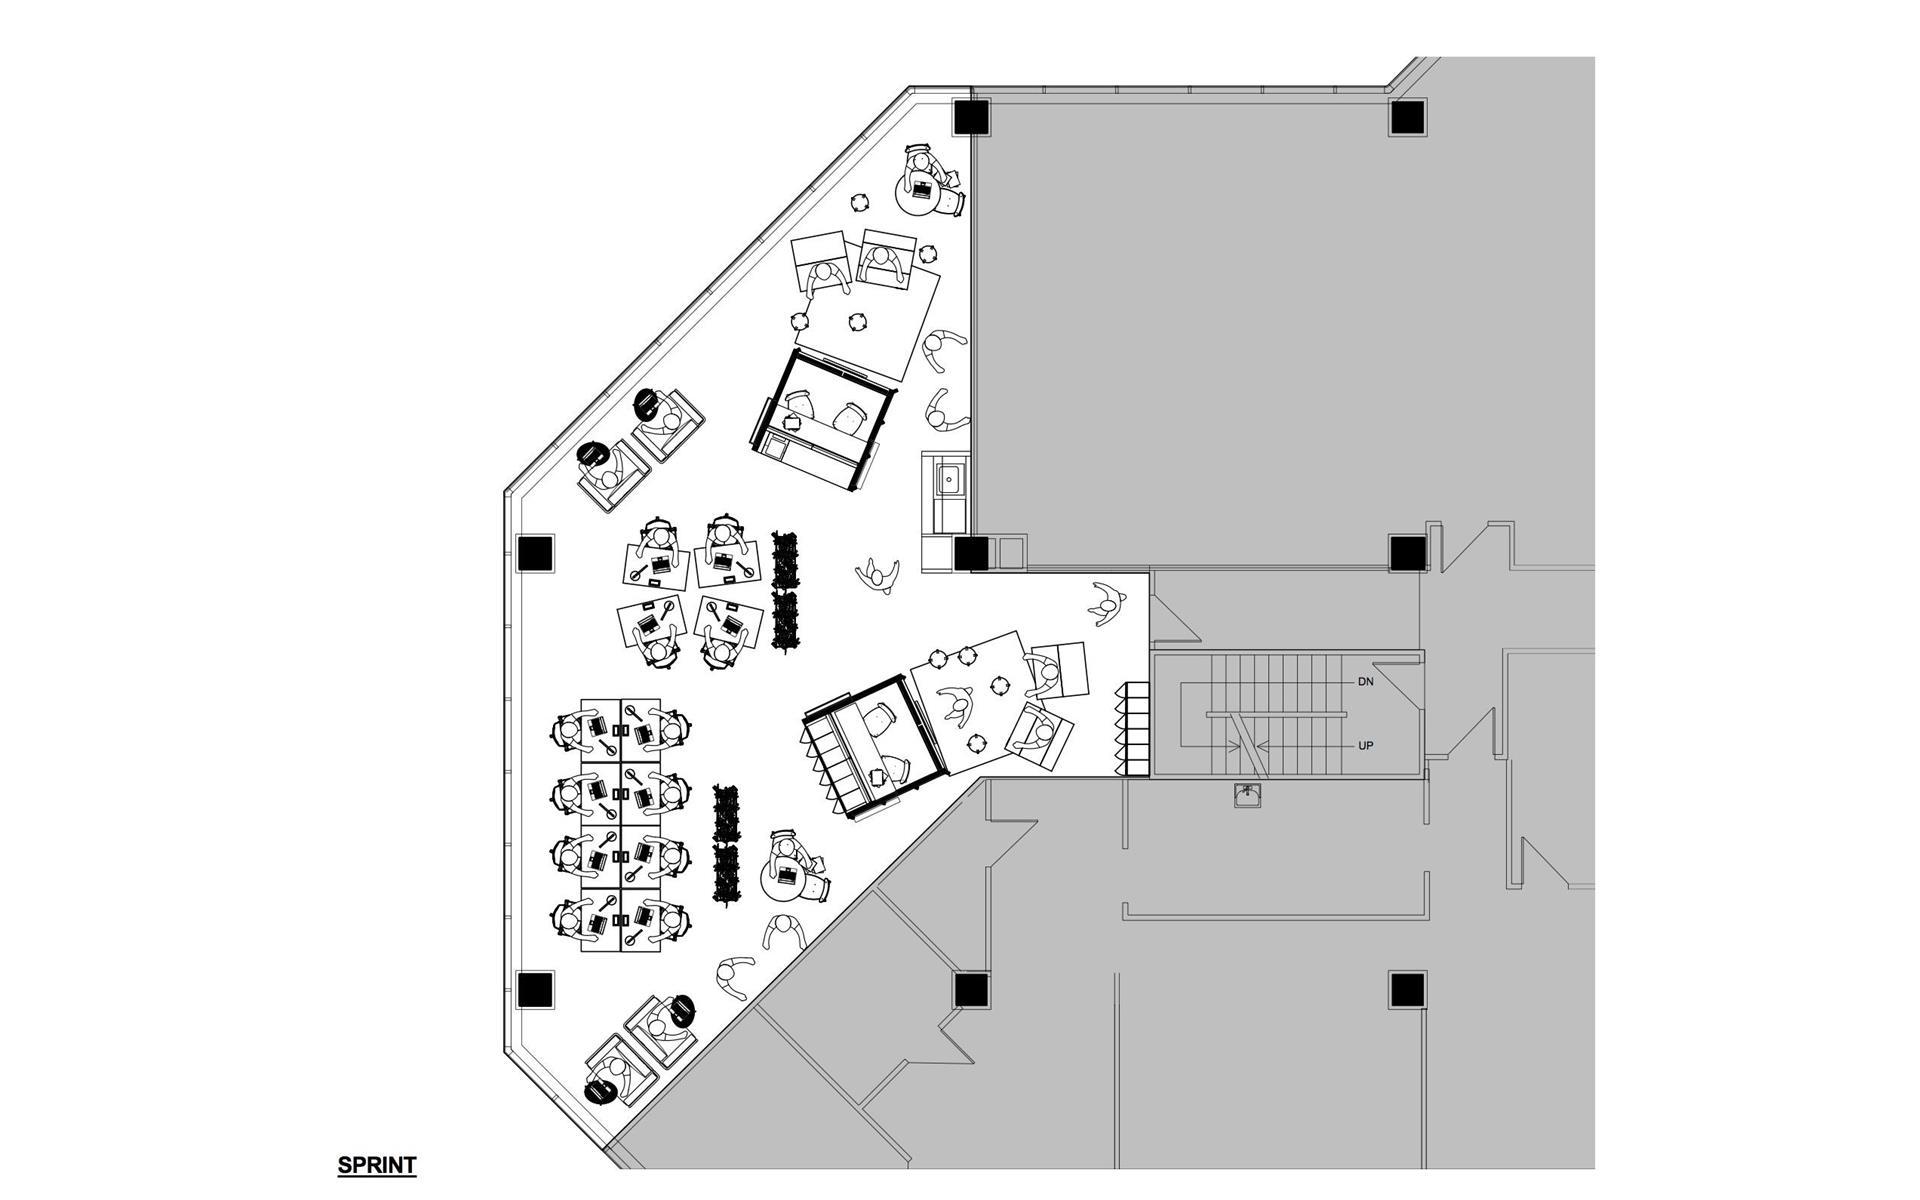 WashingtonREIT | Fairgate at Ballston - altSpace Sprint  | Suite 650